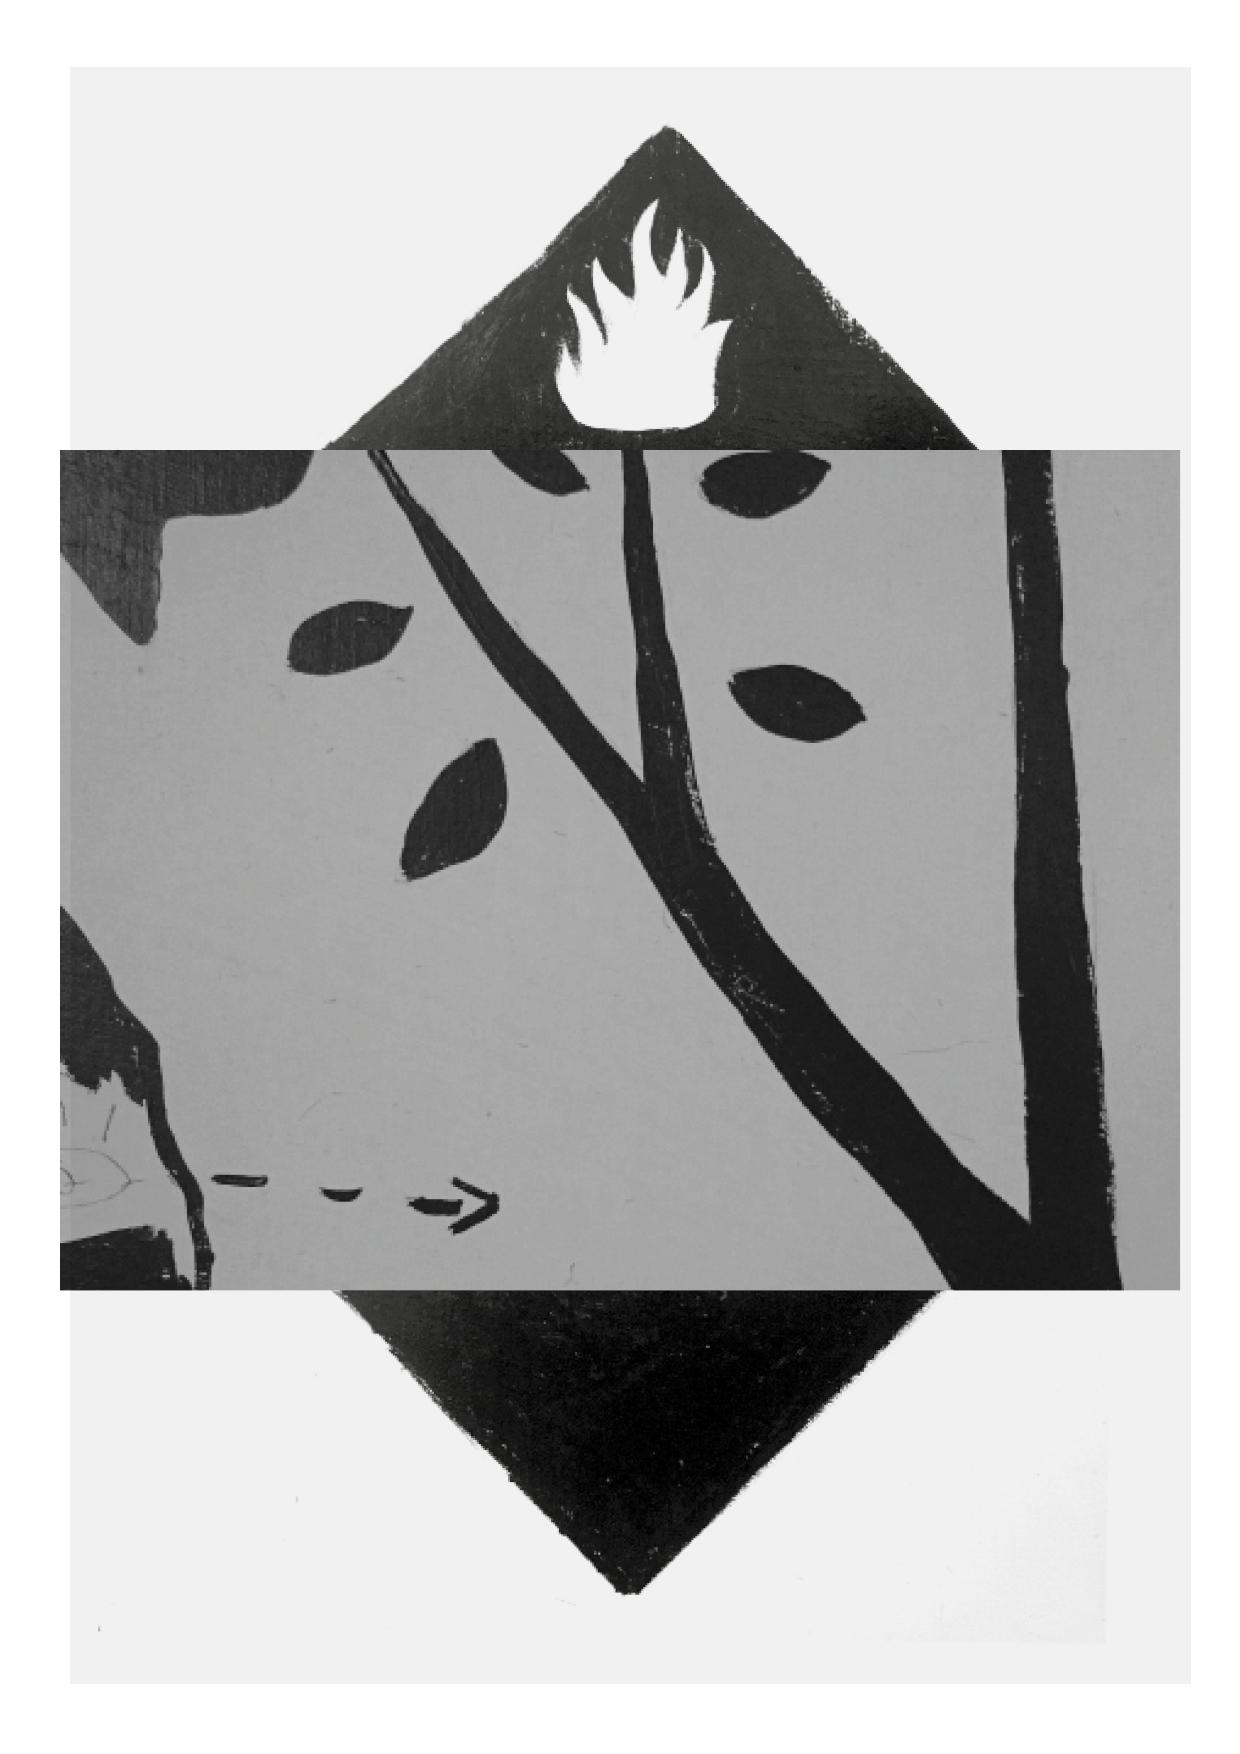 SNUFF ZINE-foxes-multistorey2.jpg